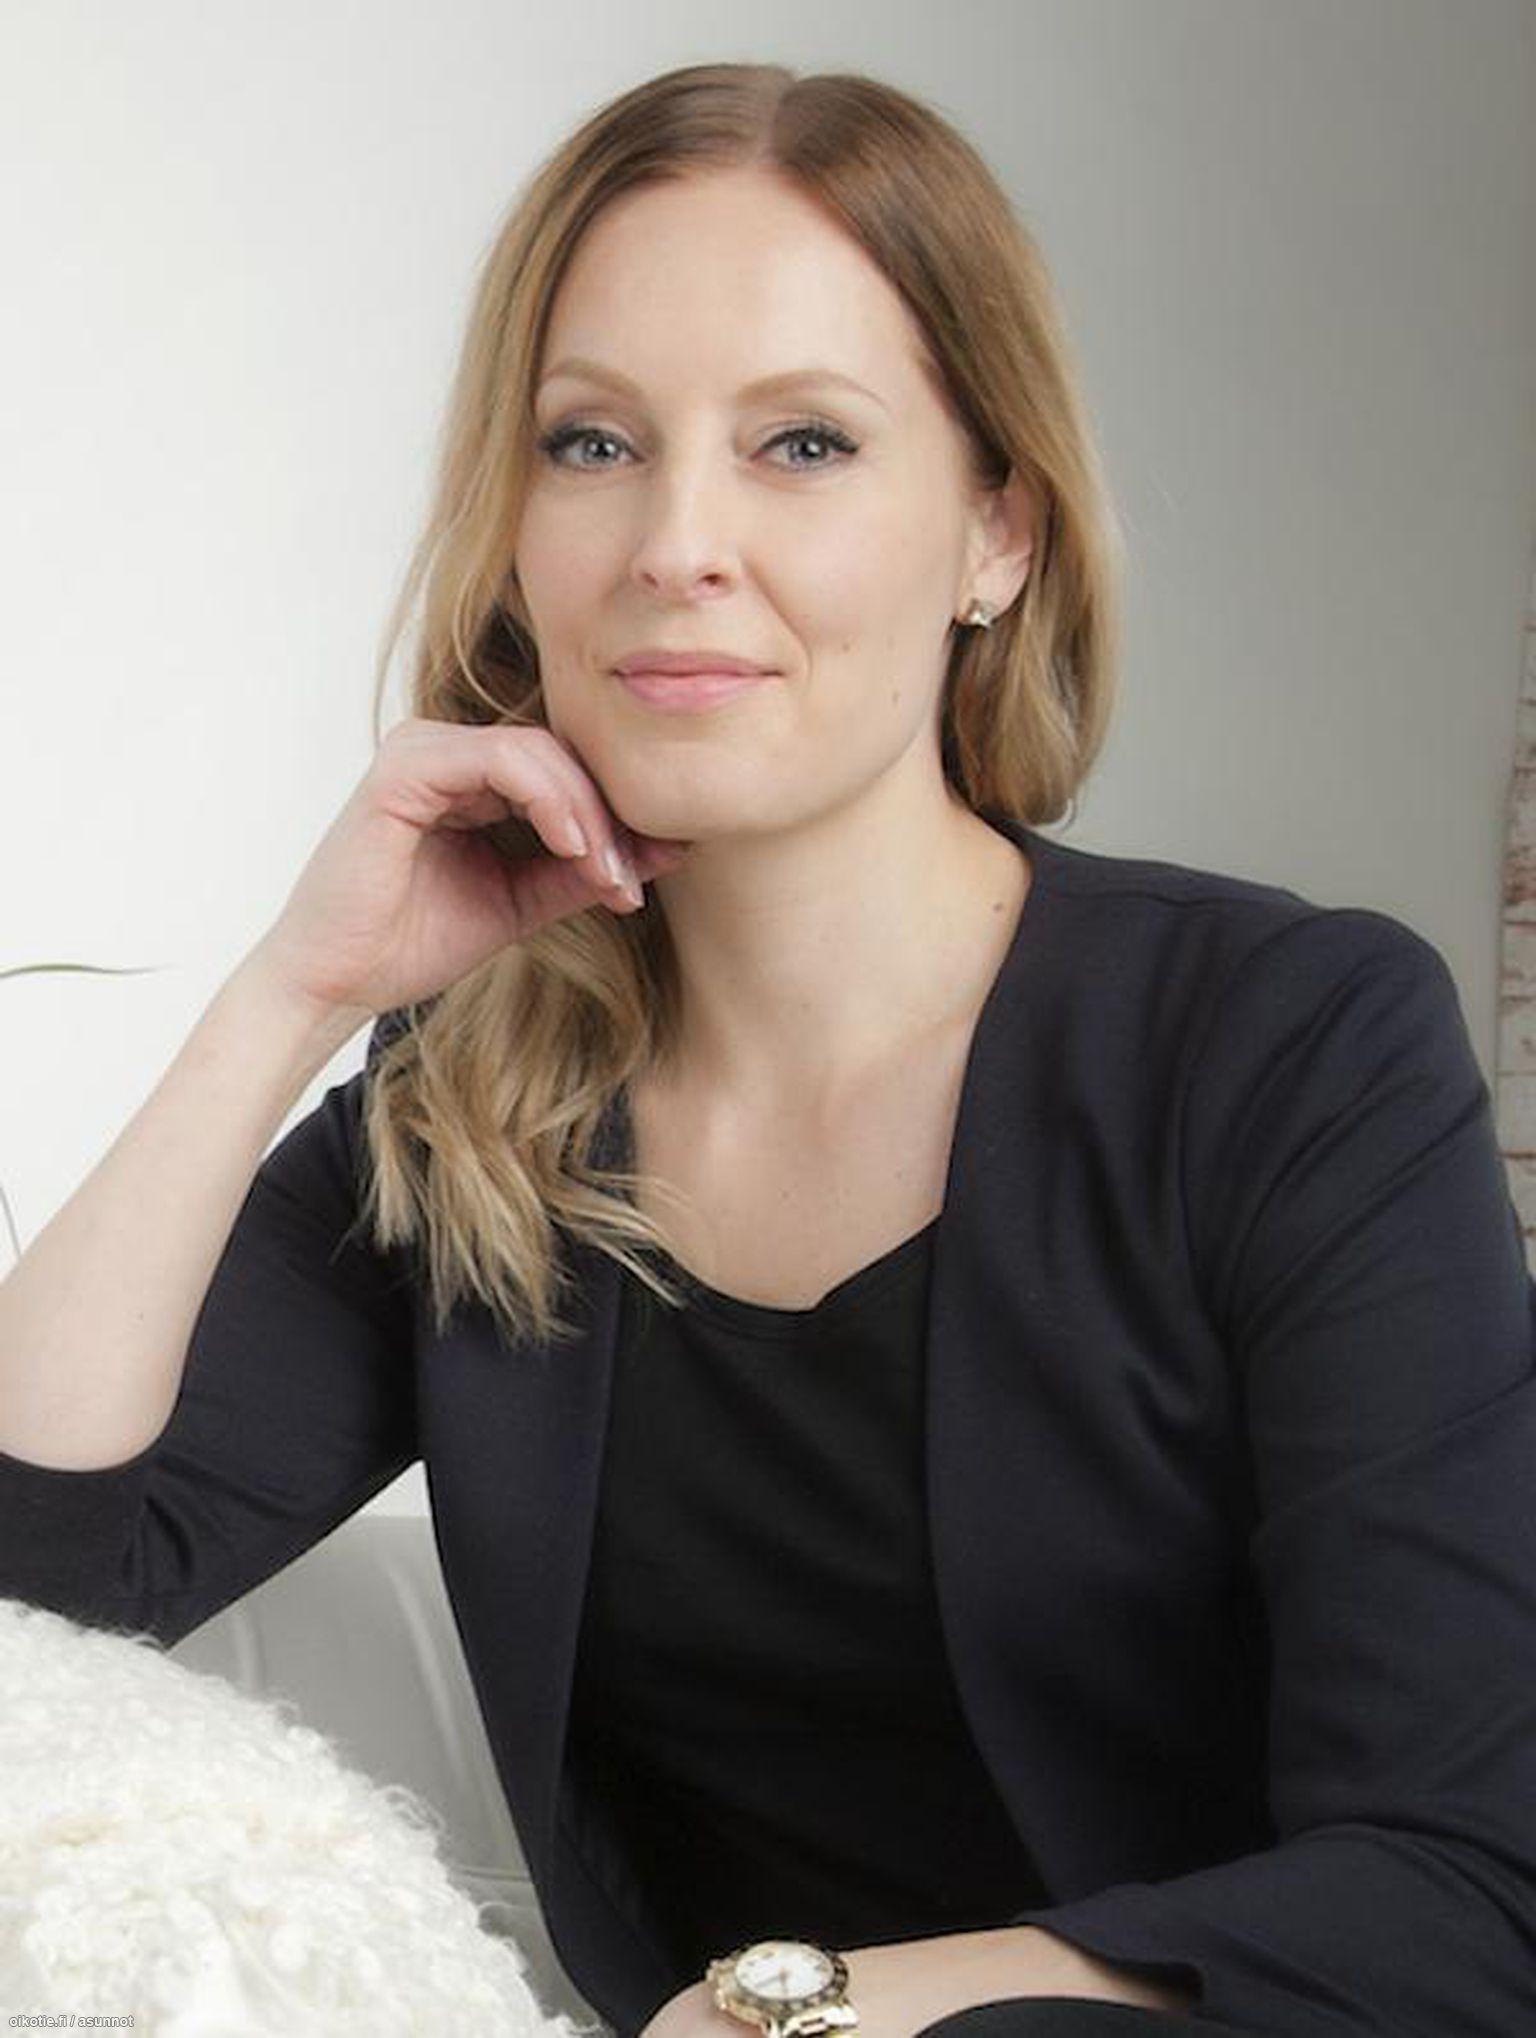 Heidi Hiltunen